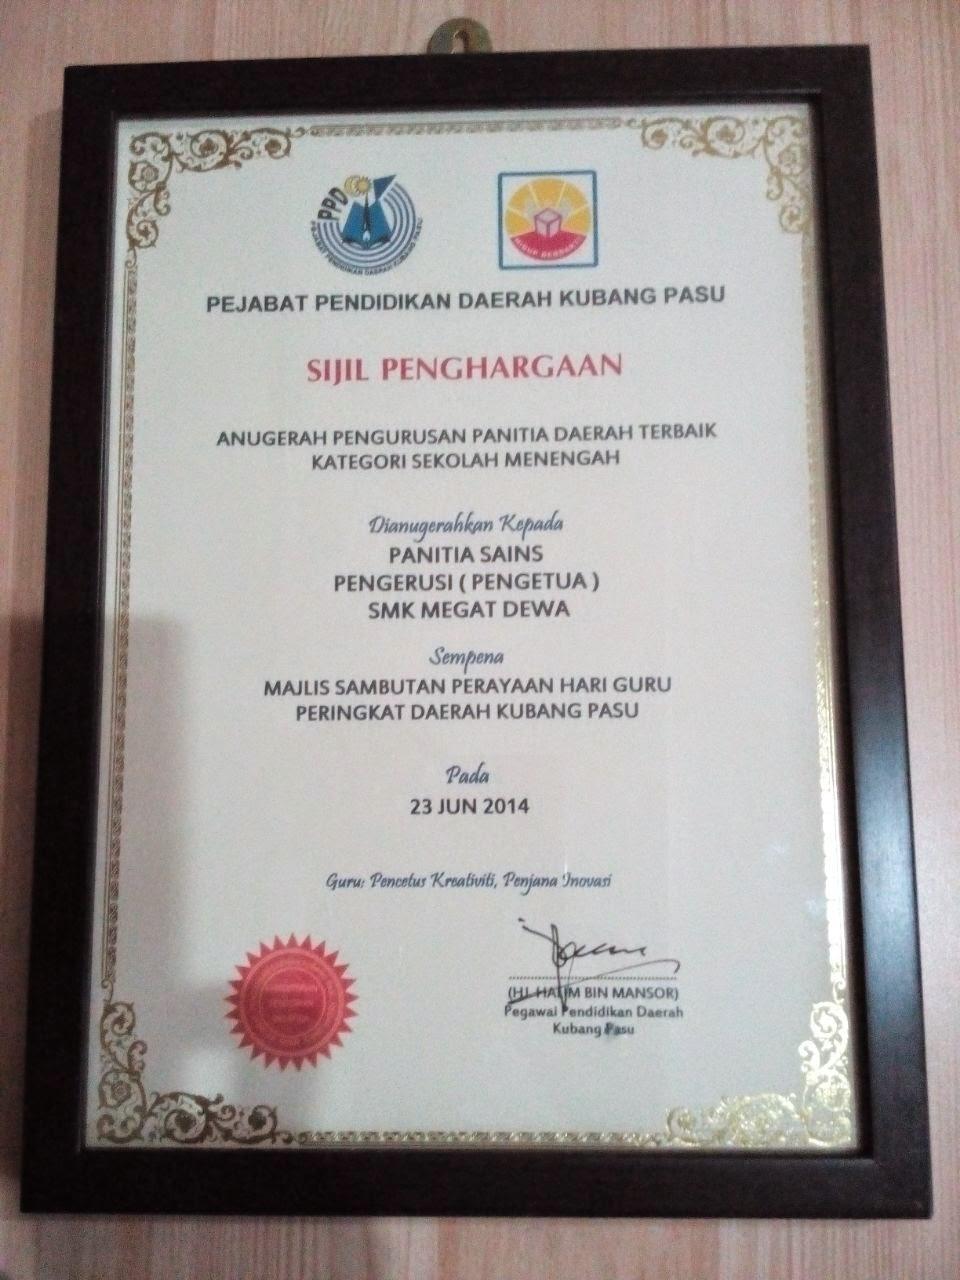 Anugerah Pengurusan Panitia Daerah Terbaik Kategori Sekolah Menengah 2014